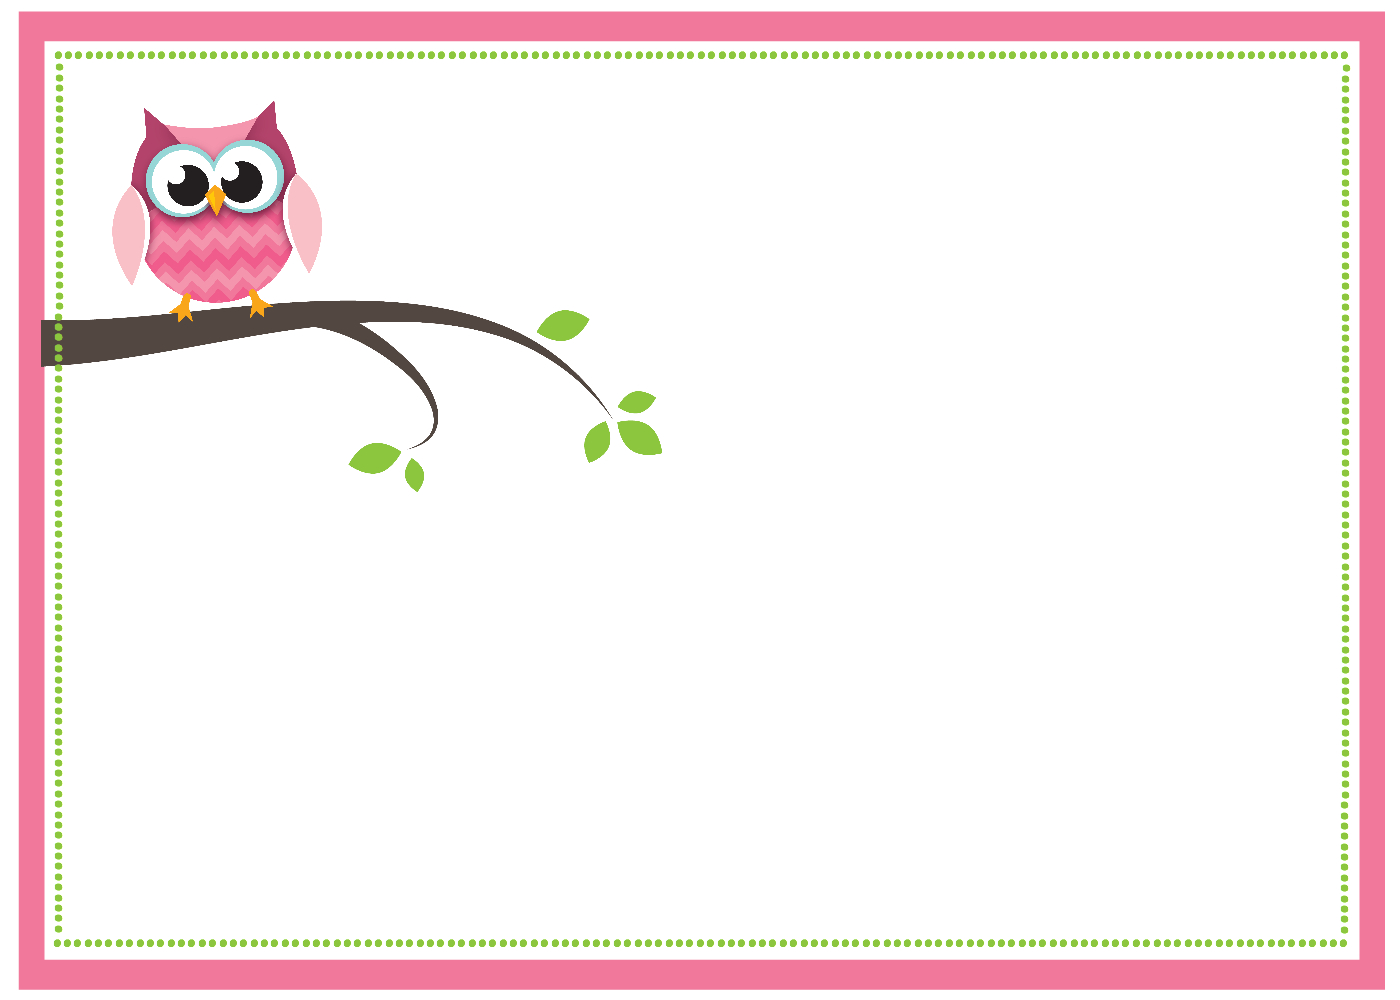 Free Printable Owl Baby Shower Invitations {& Other Printables} - Free Owl Printables